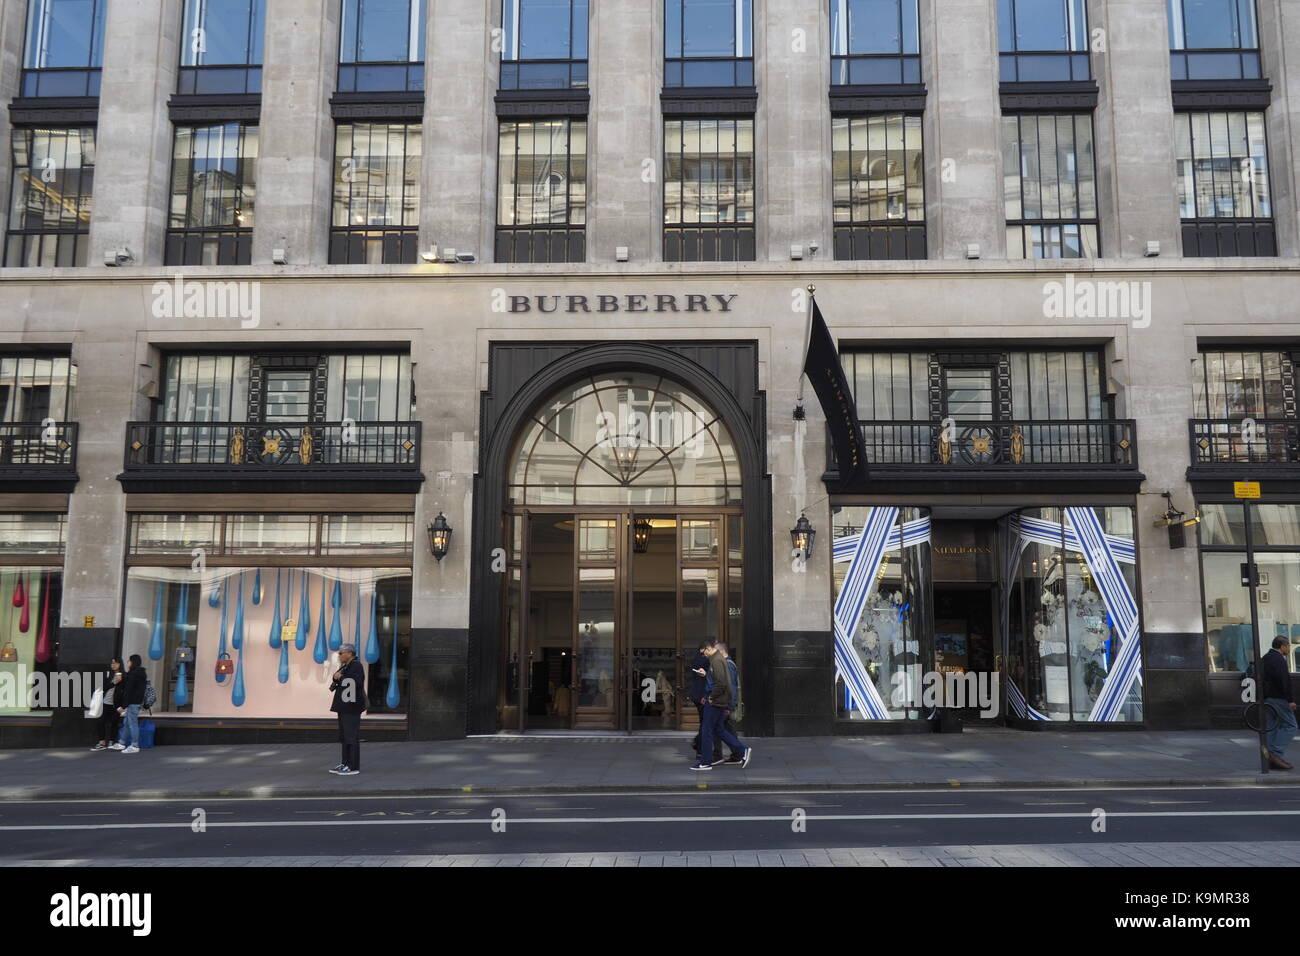 Burberry Regent Street Stock Photos & Burberry Regent ...